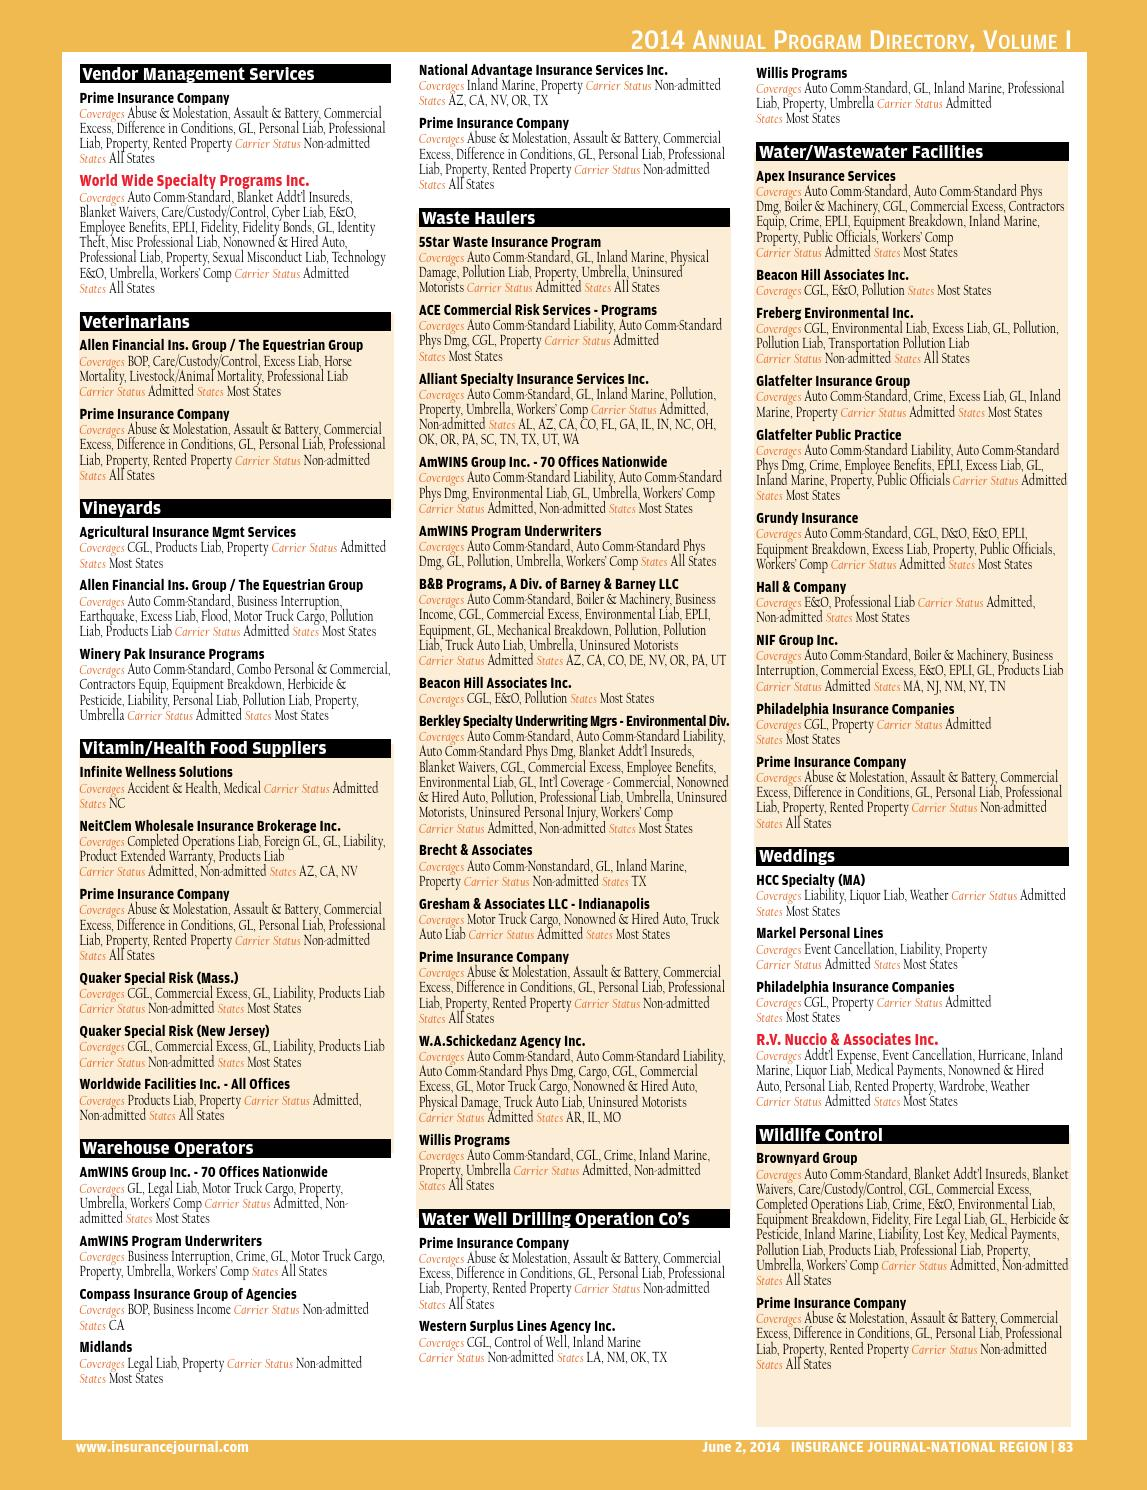 Insurance Journal West 2014 06 02 by Insurance Journal - issuu